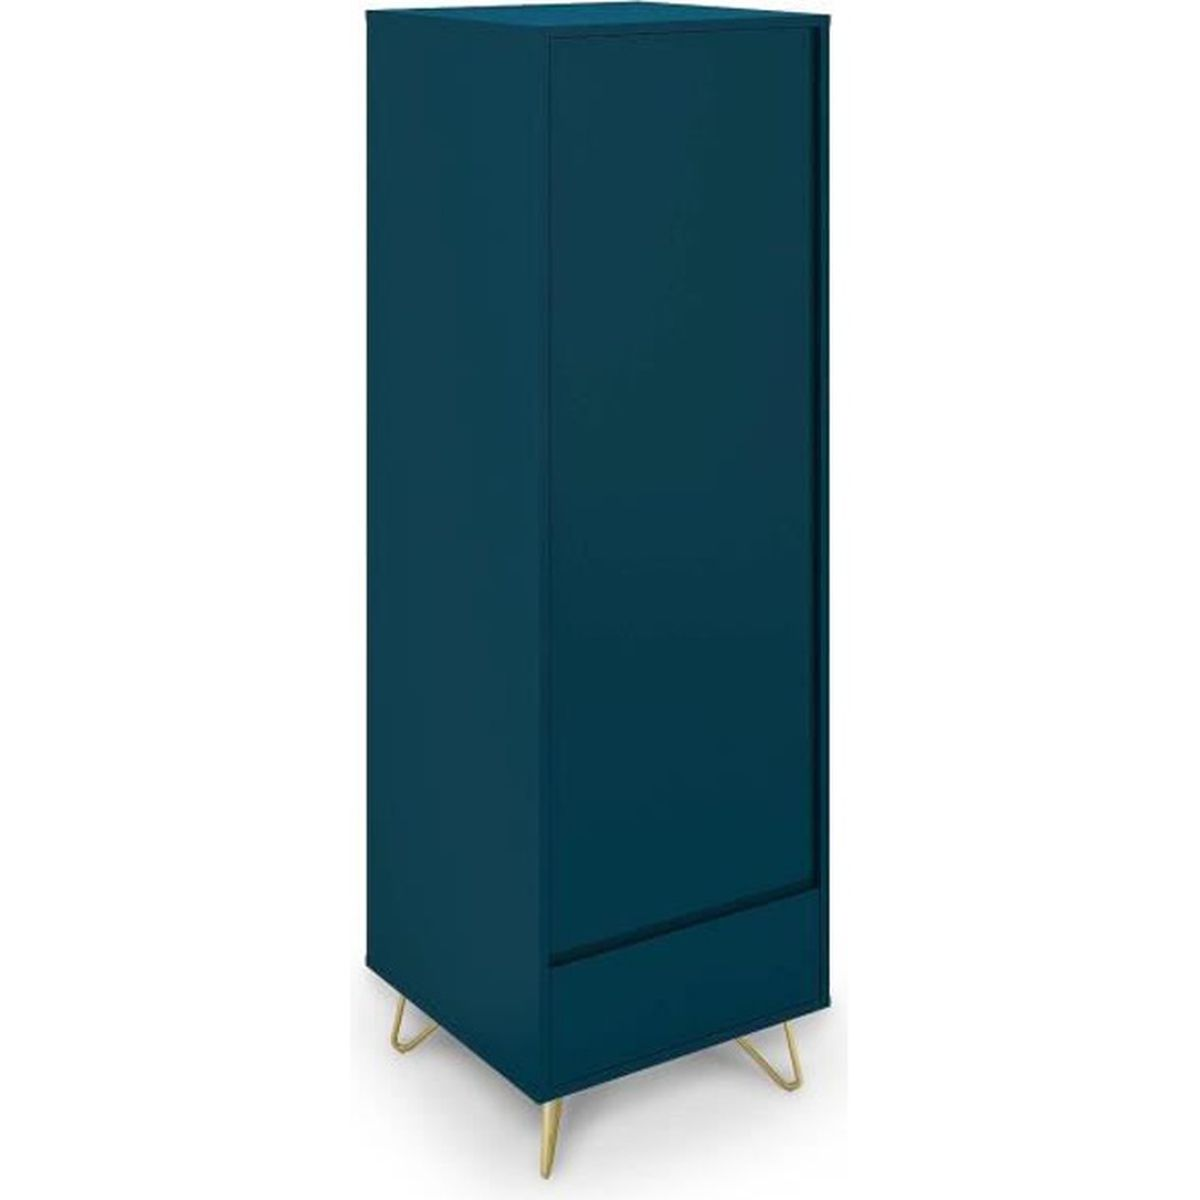 Armoire Dressing Chambre Adulte armoire penderie 1 porte 1 tiroir bleu canard darina - achat